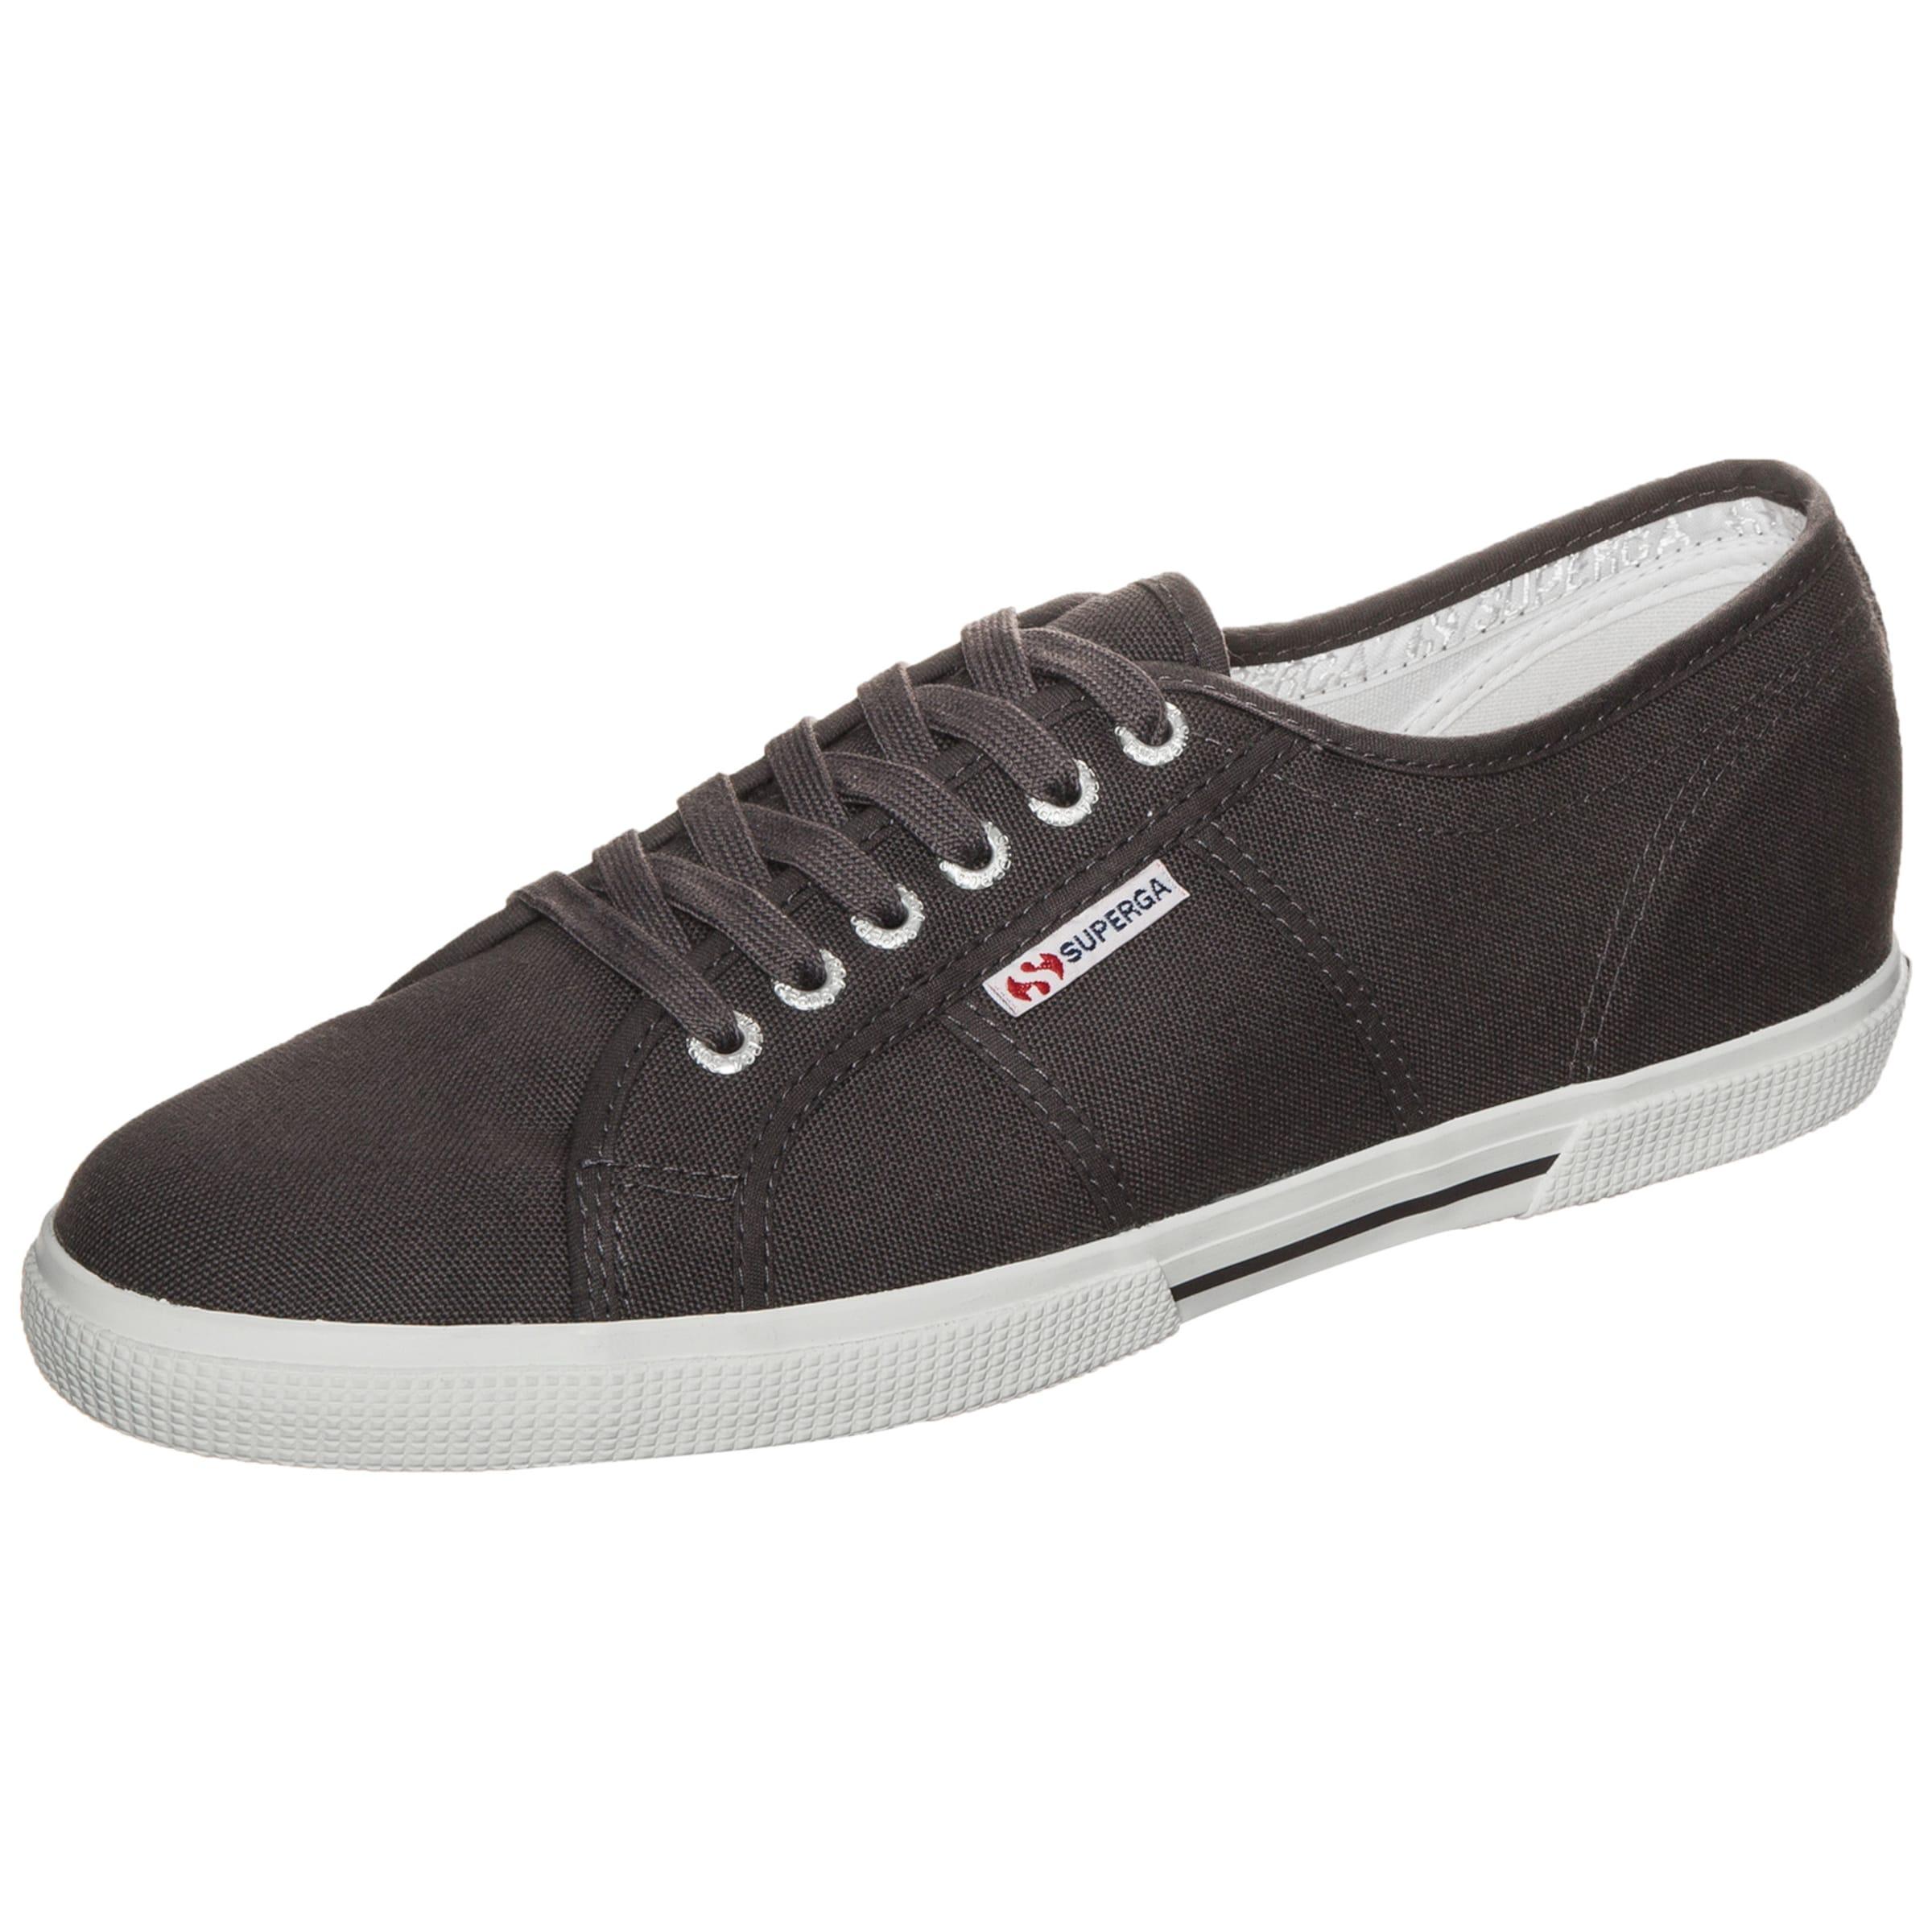 SUPERGA  2950 Cotu Classic  Sneaker